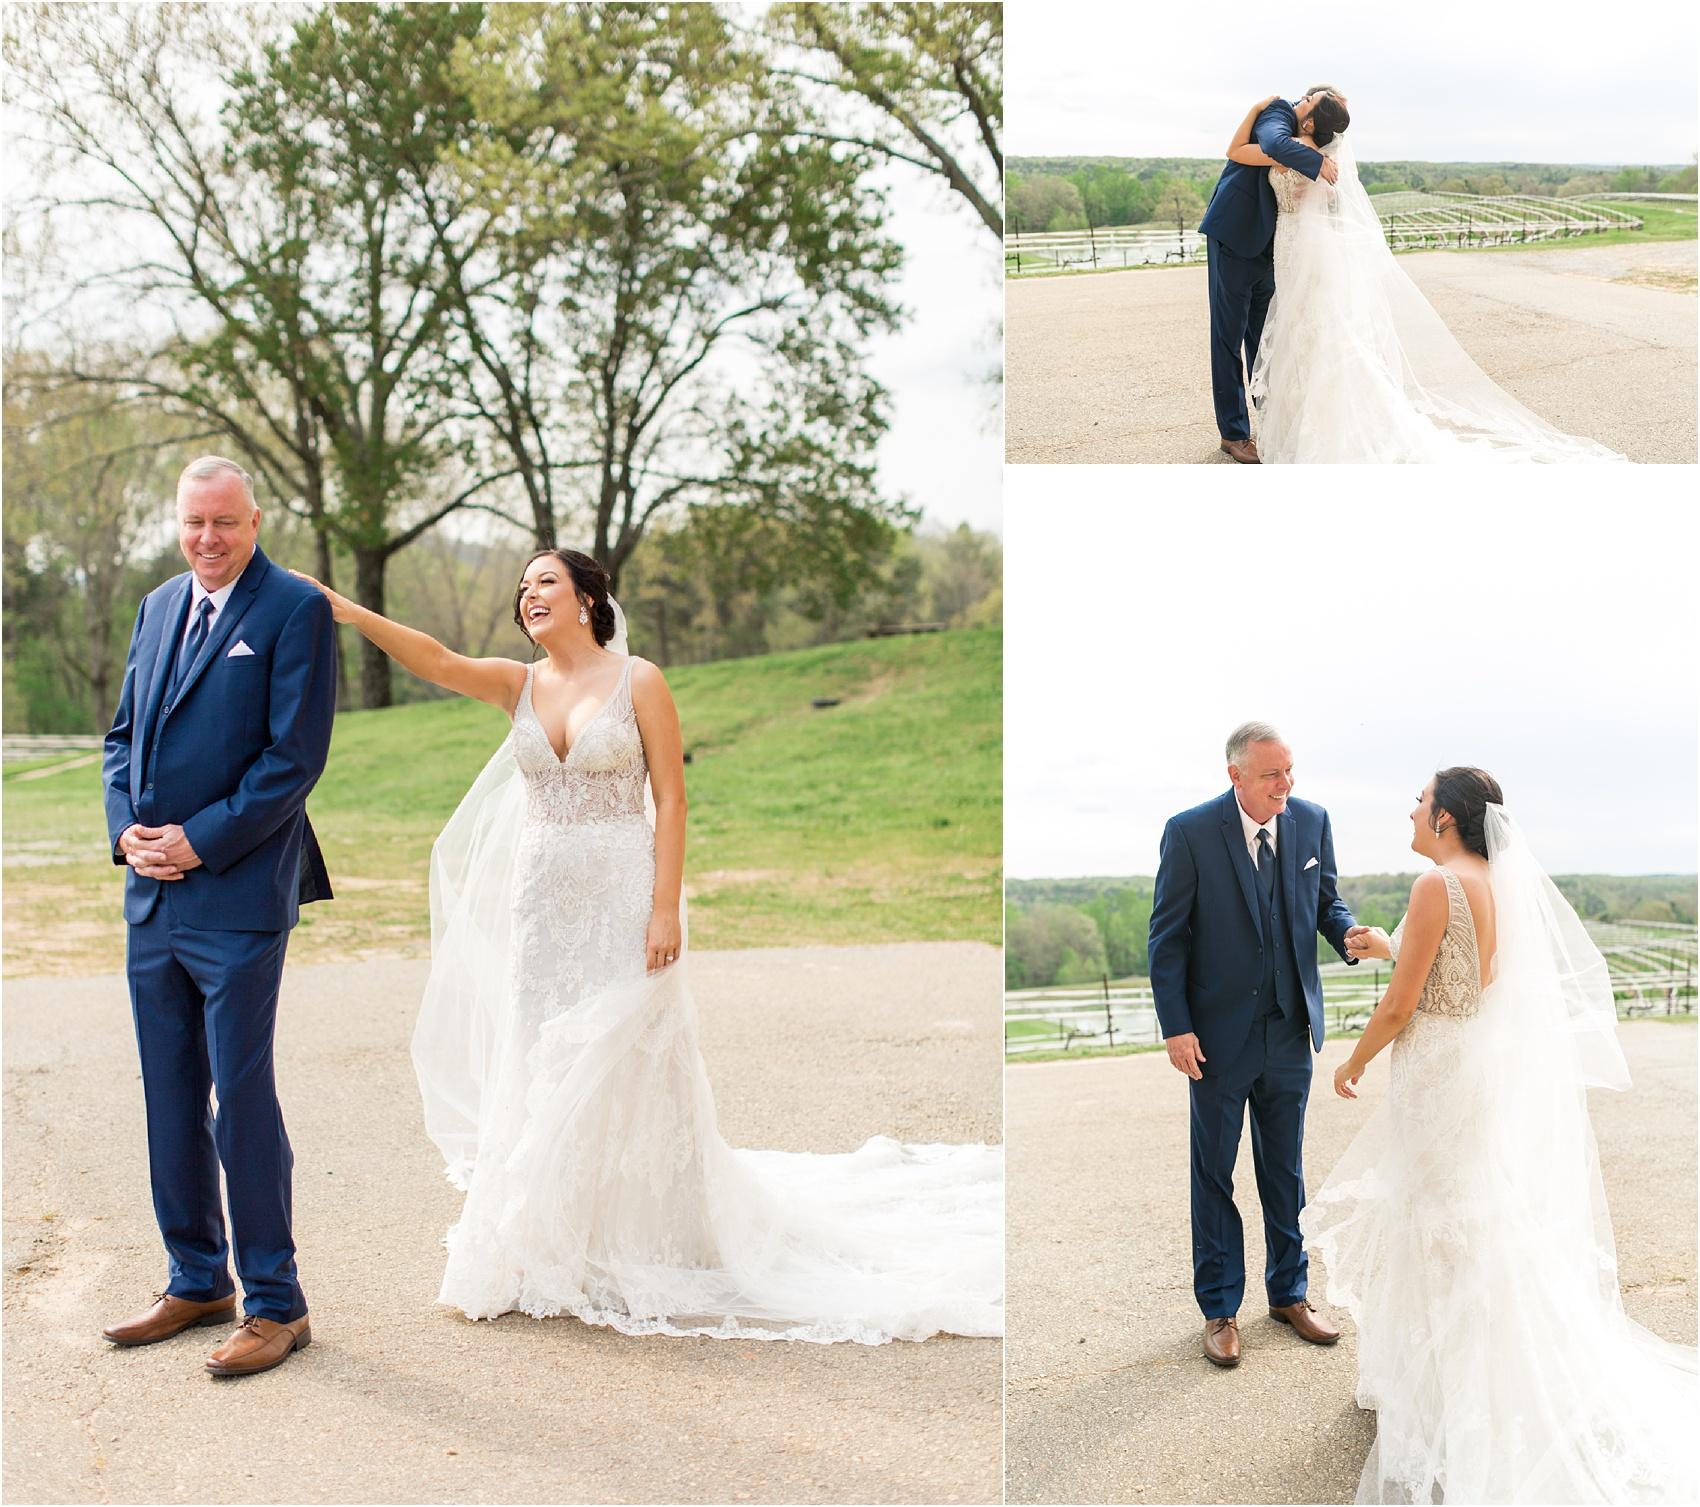 Savannah Eve Photography- Turnbill-Gilgan Wedding- Blog-18.jpg